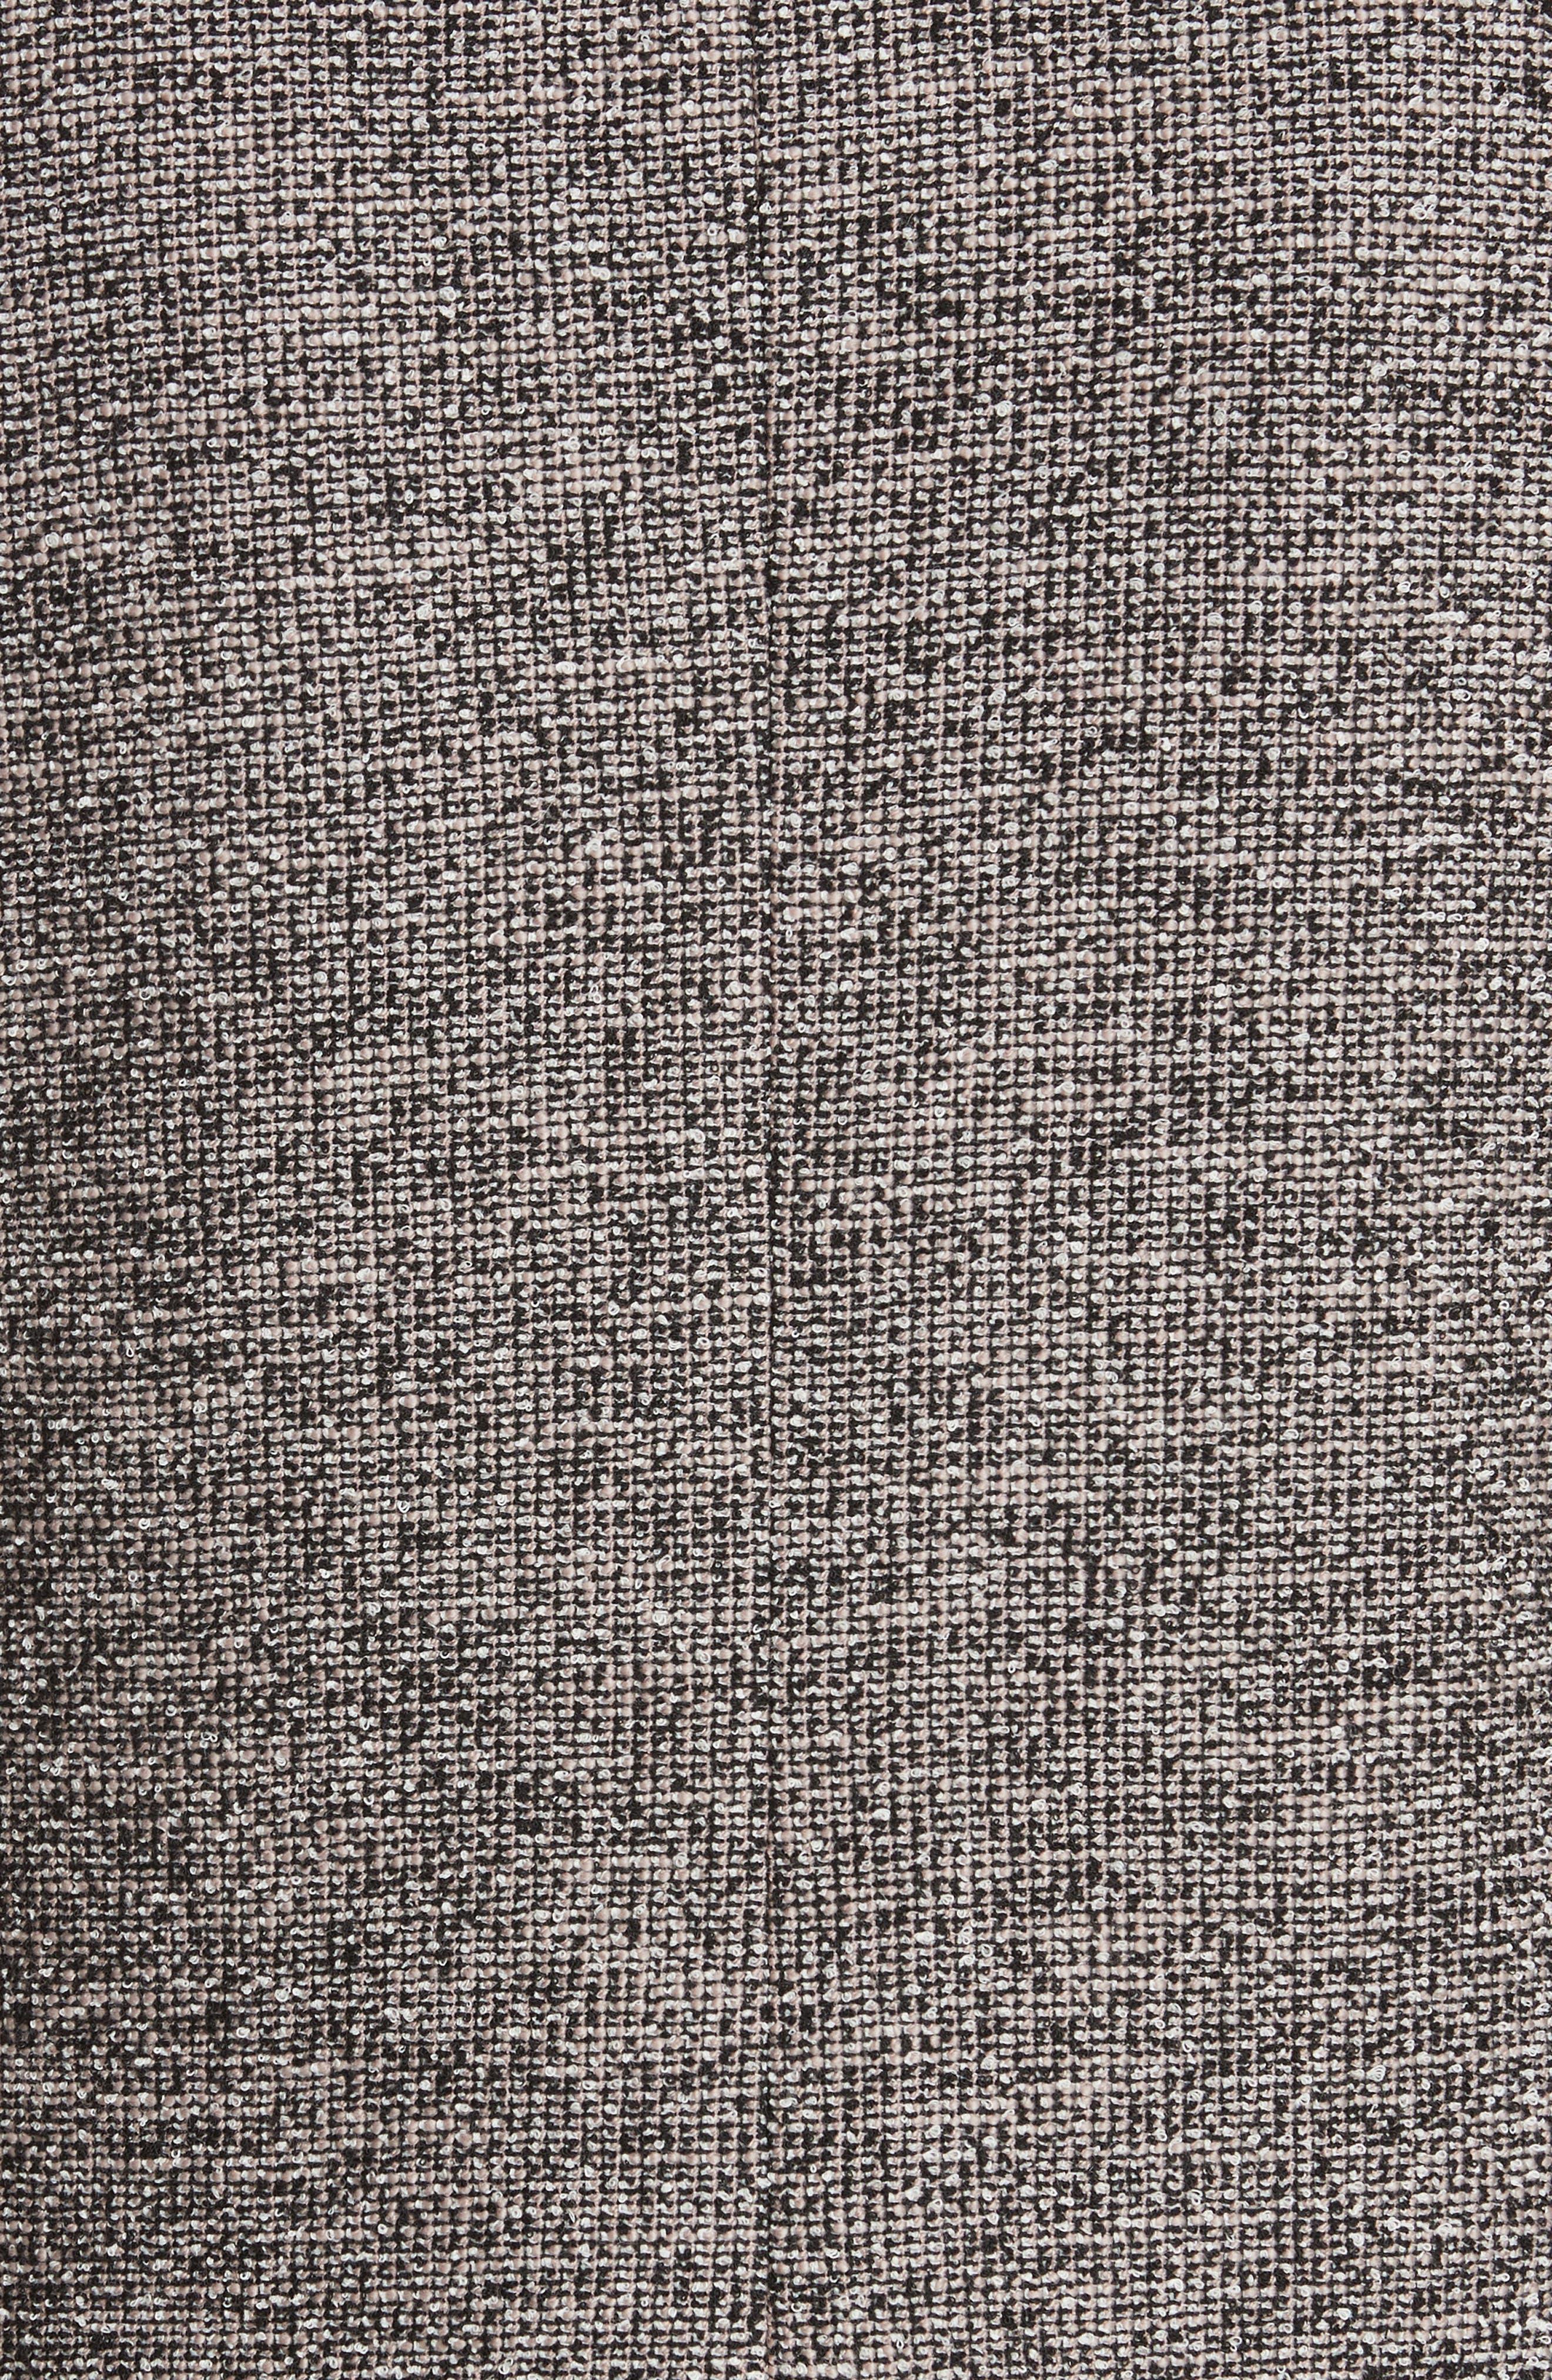 Embellished Stretch Tweed Jacket,                             Alternate thumbnail 5, color,                             Nude Combo